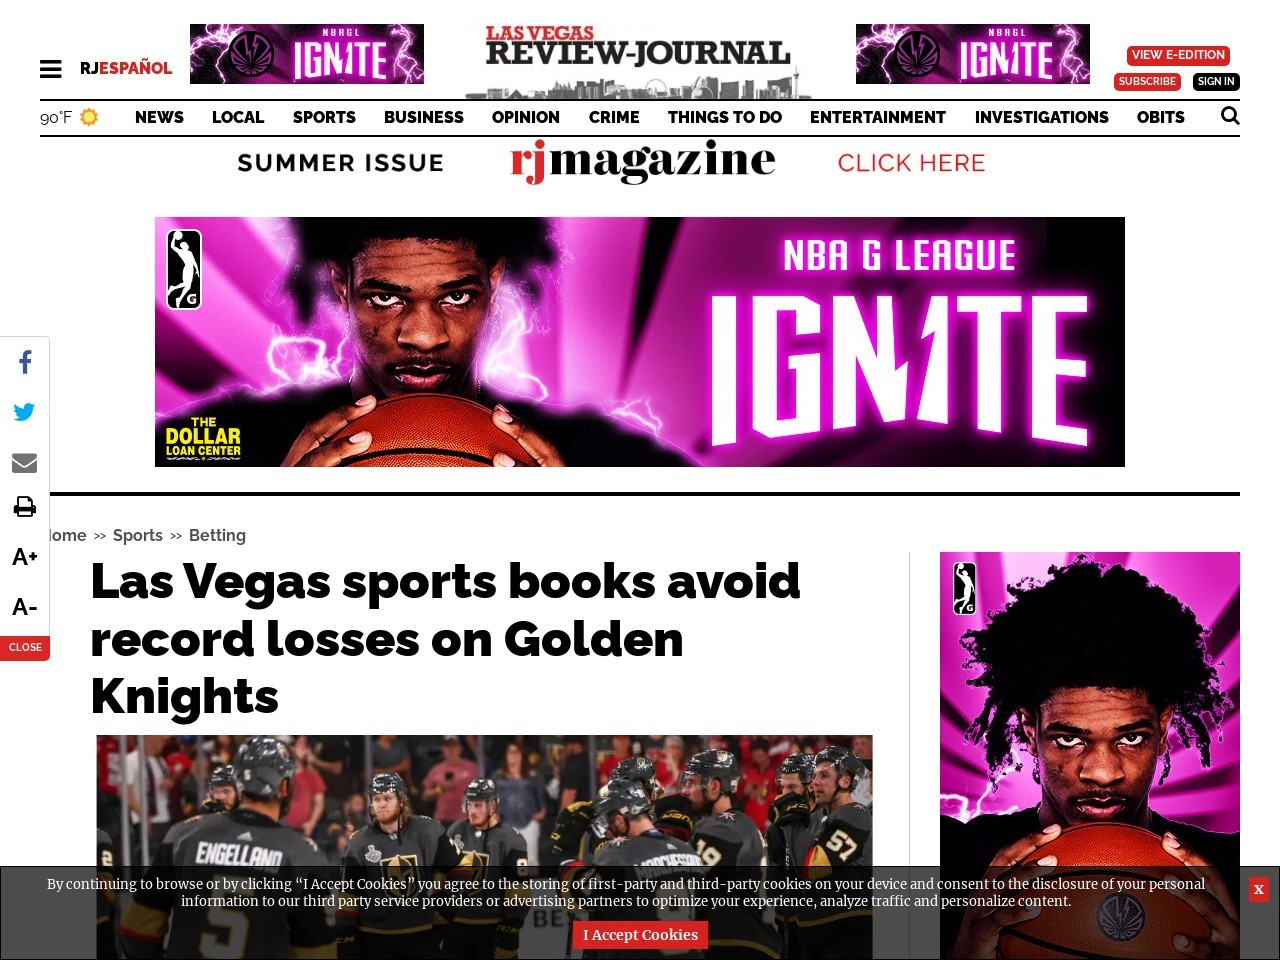 Las Vegas sports books avoid record losses on Golden Knights